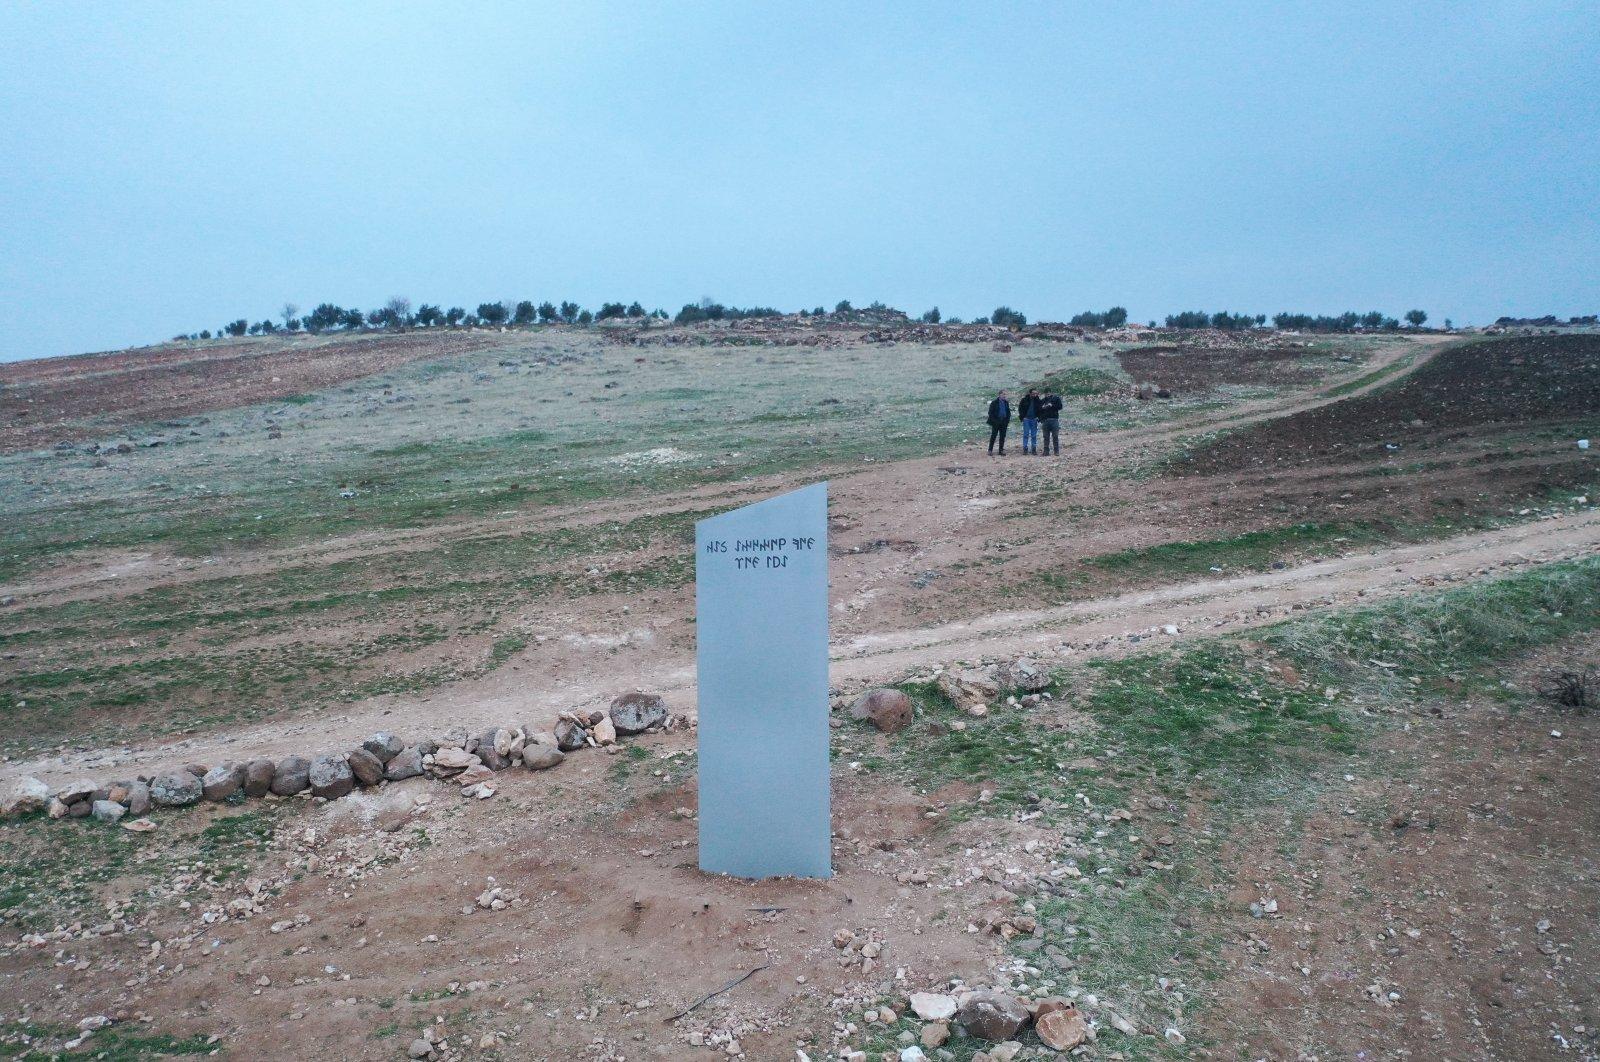 A view of the monolith before its disappearance, in Şanlıurfa, southeastern Turkey, Feb. 8, 2021. (AA Photo)